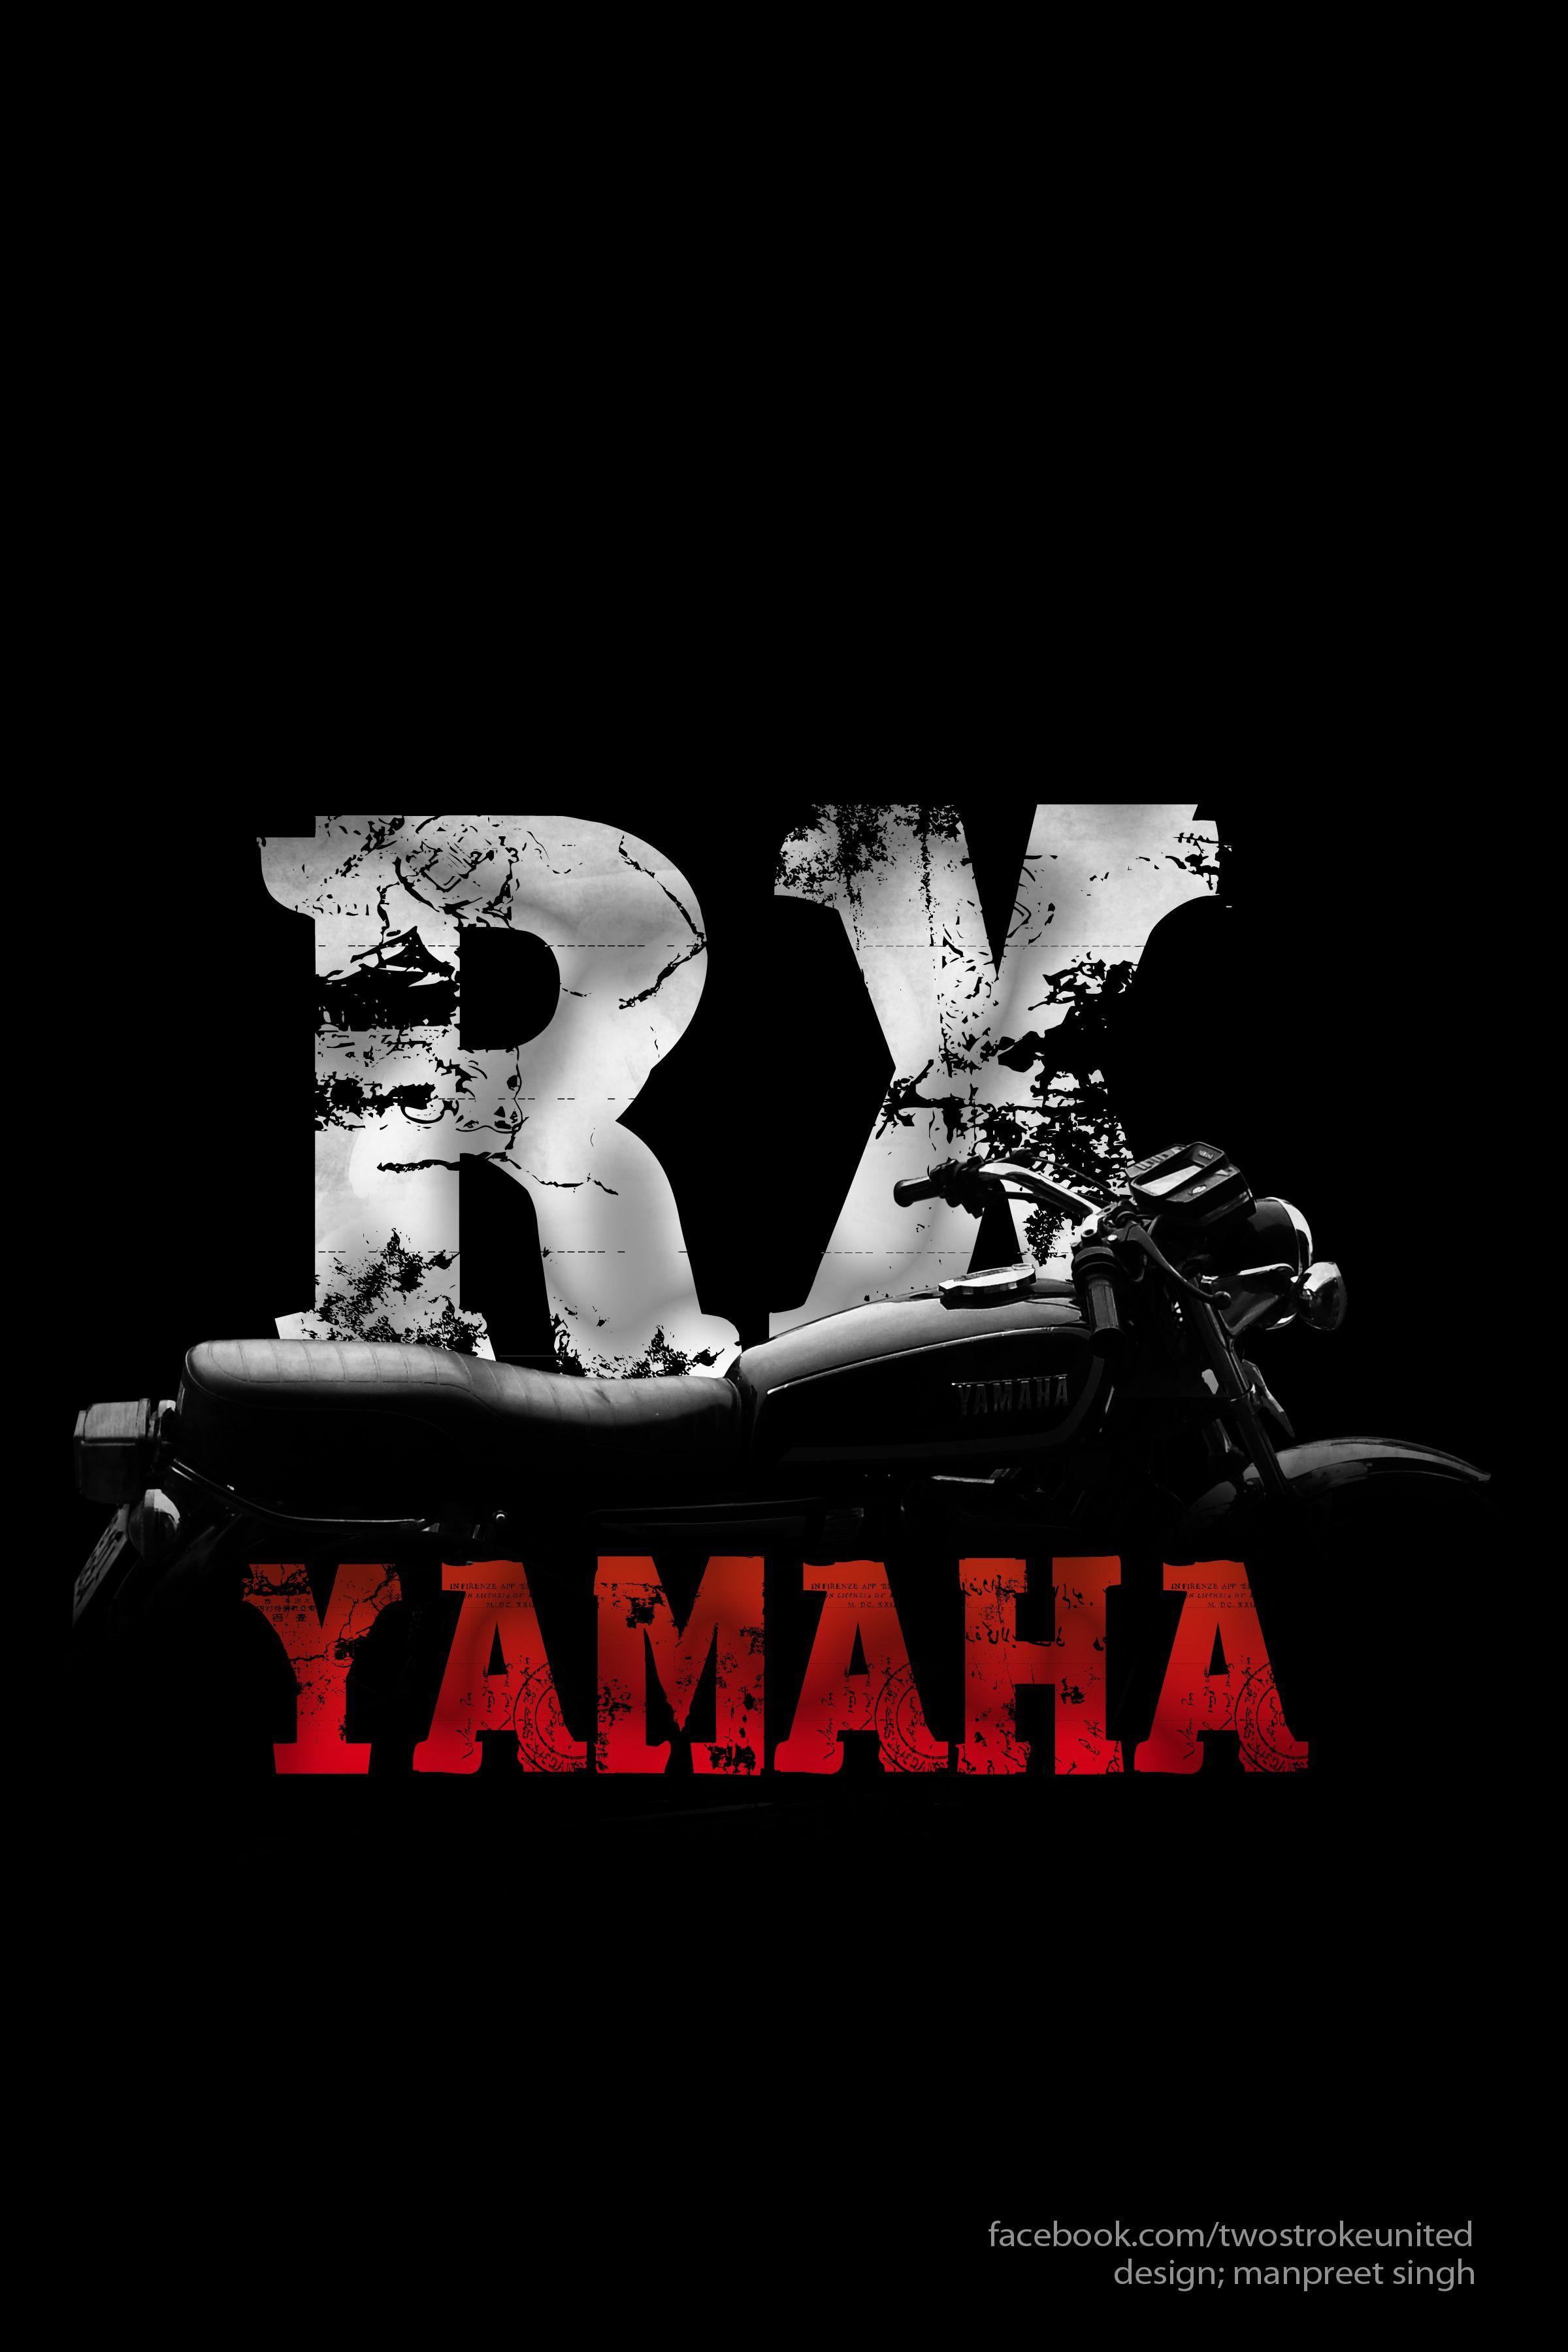 Twostrokeunited Rx100 Rx135 Yamaha Punjab Patiala Hi I Am